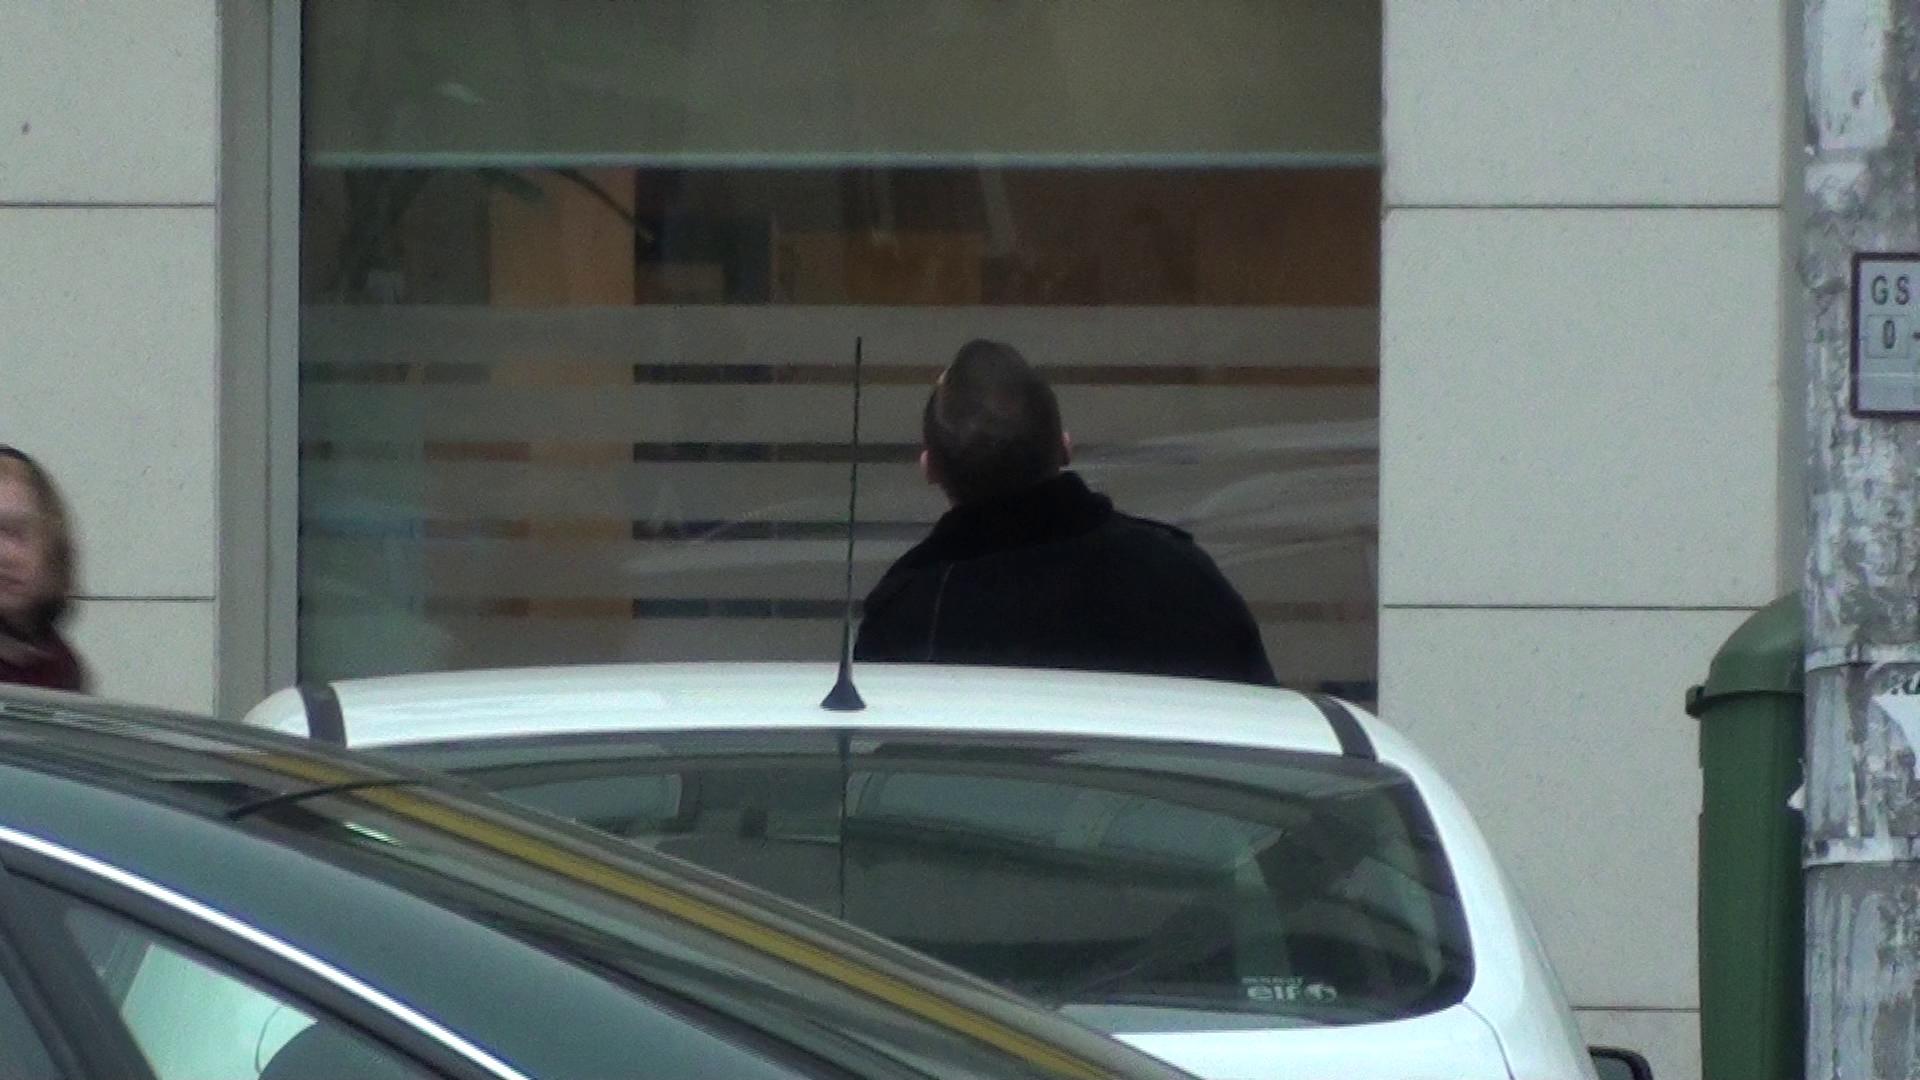 Vasile Geambazii poarta o conversatie cu o domnisoara la balcon